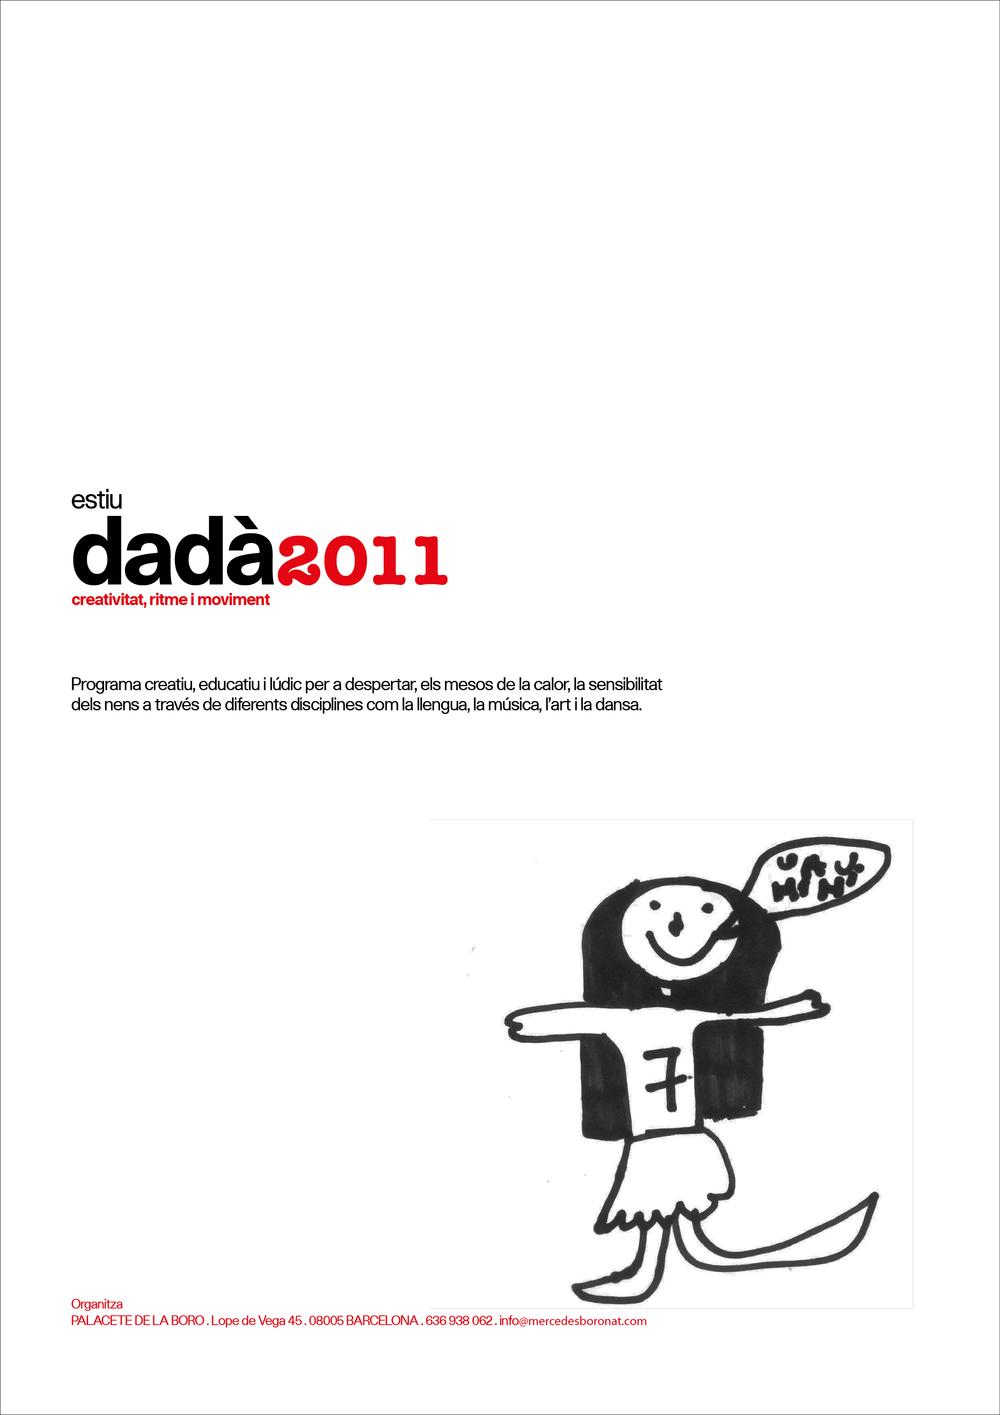 Casal d'estiu 2011  [PDF]